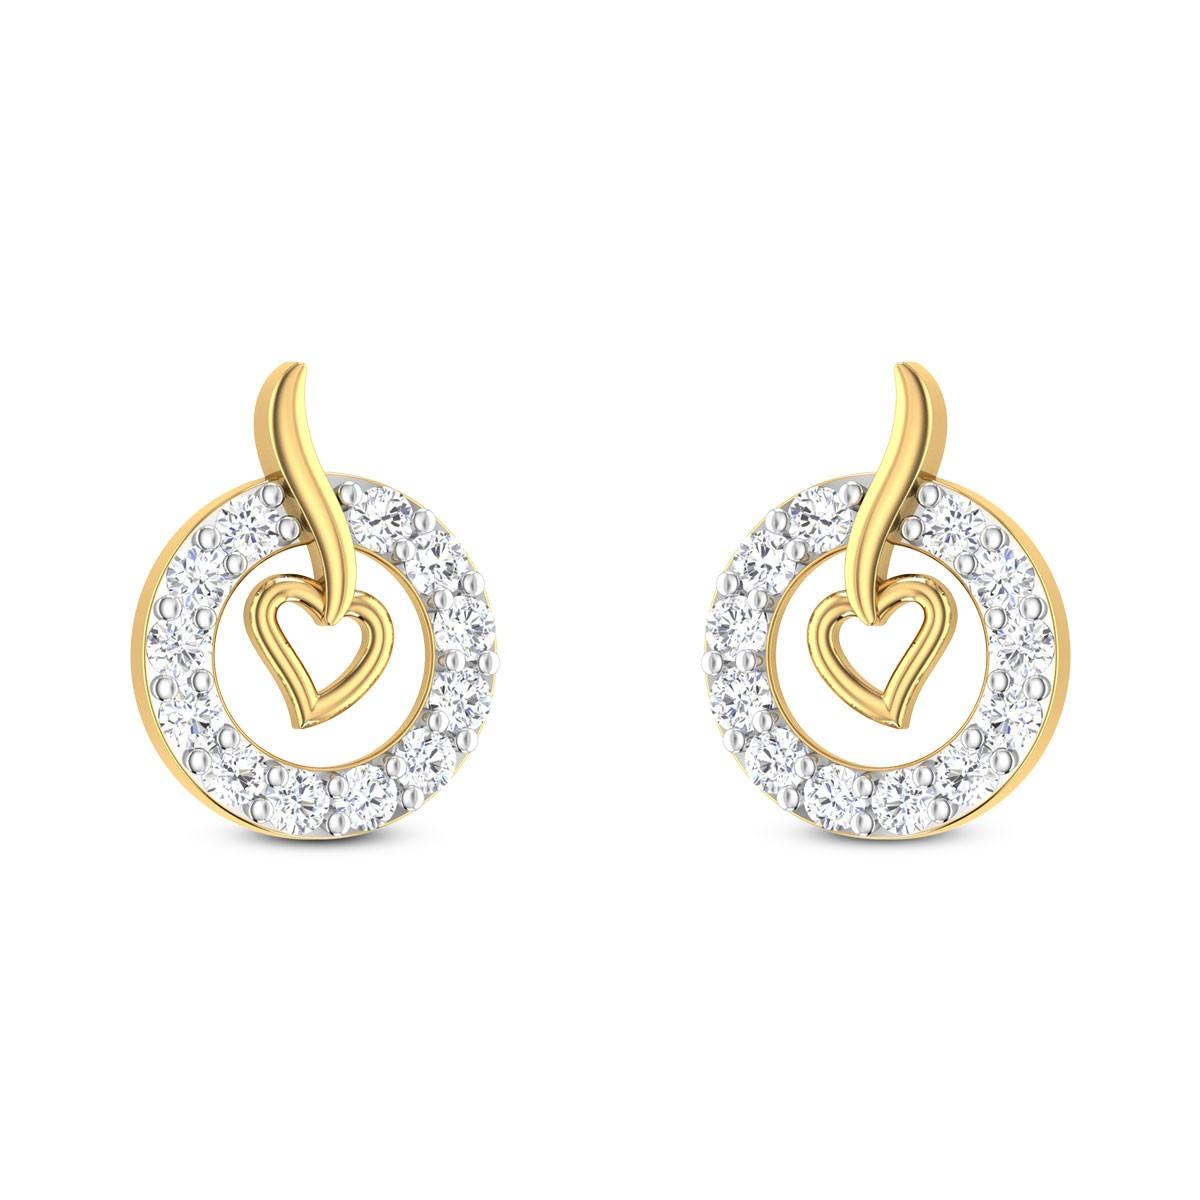 Macie Diamond Earrings